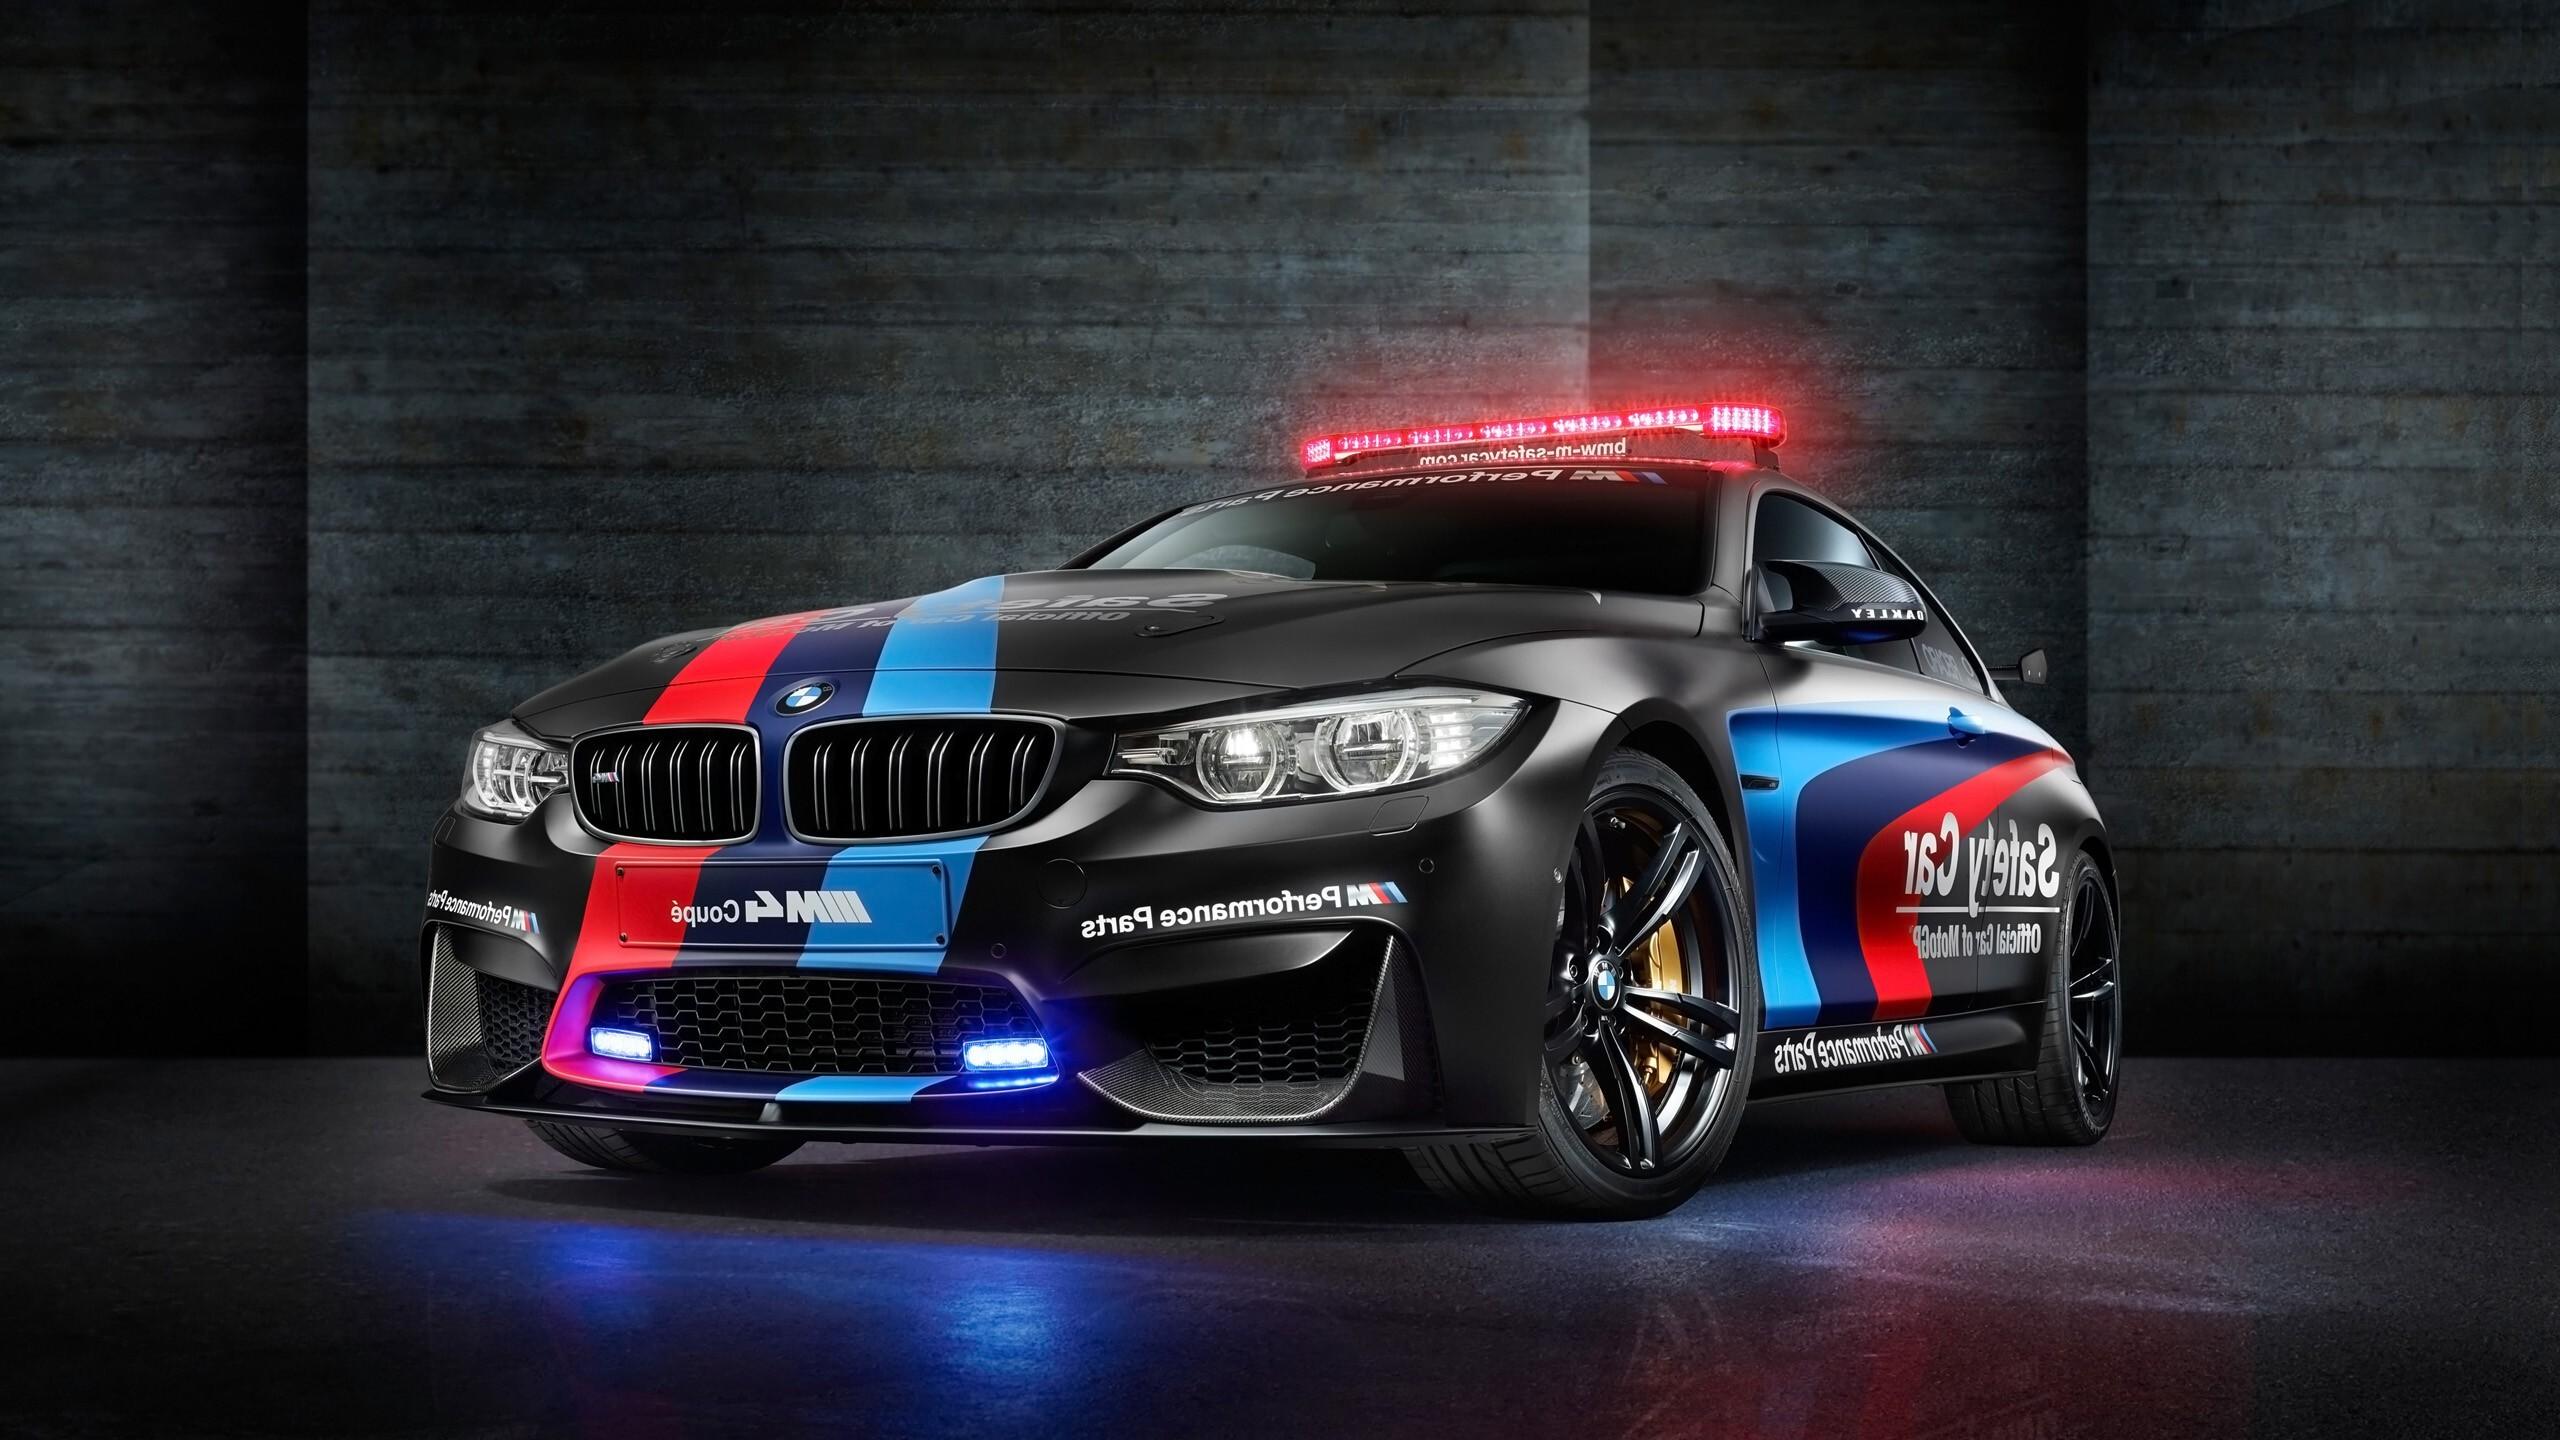 2560x1440 BMW M4 MotoGP Safety Car 1440P Resolution HD 4k ...